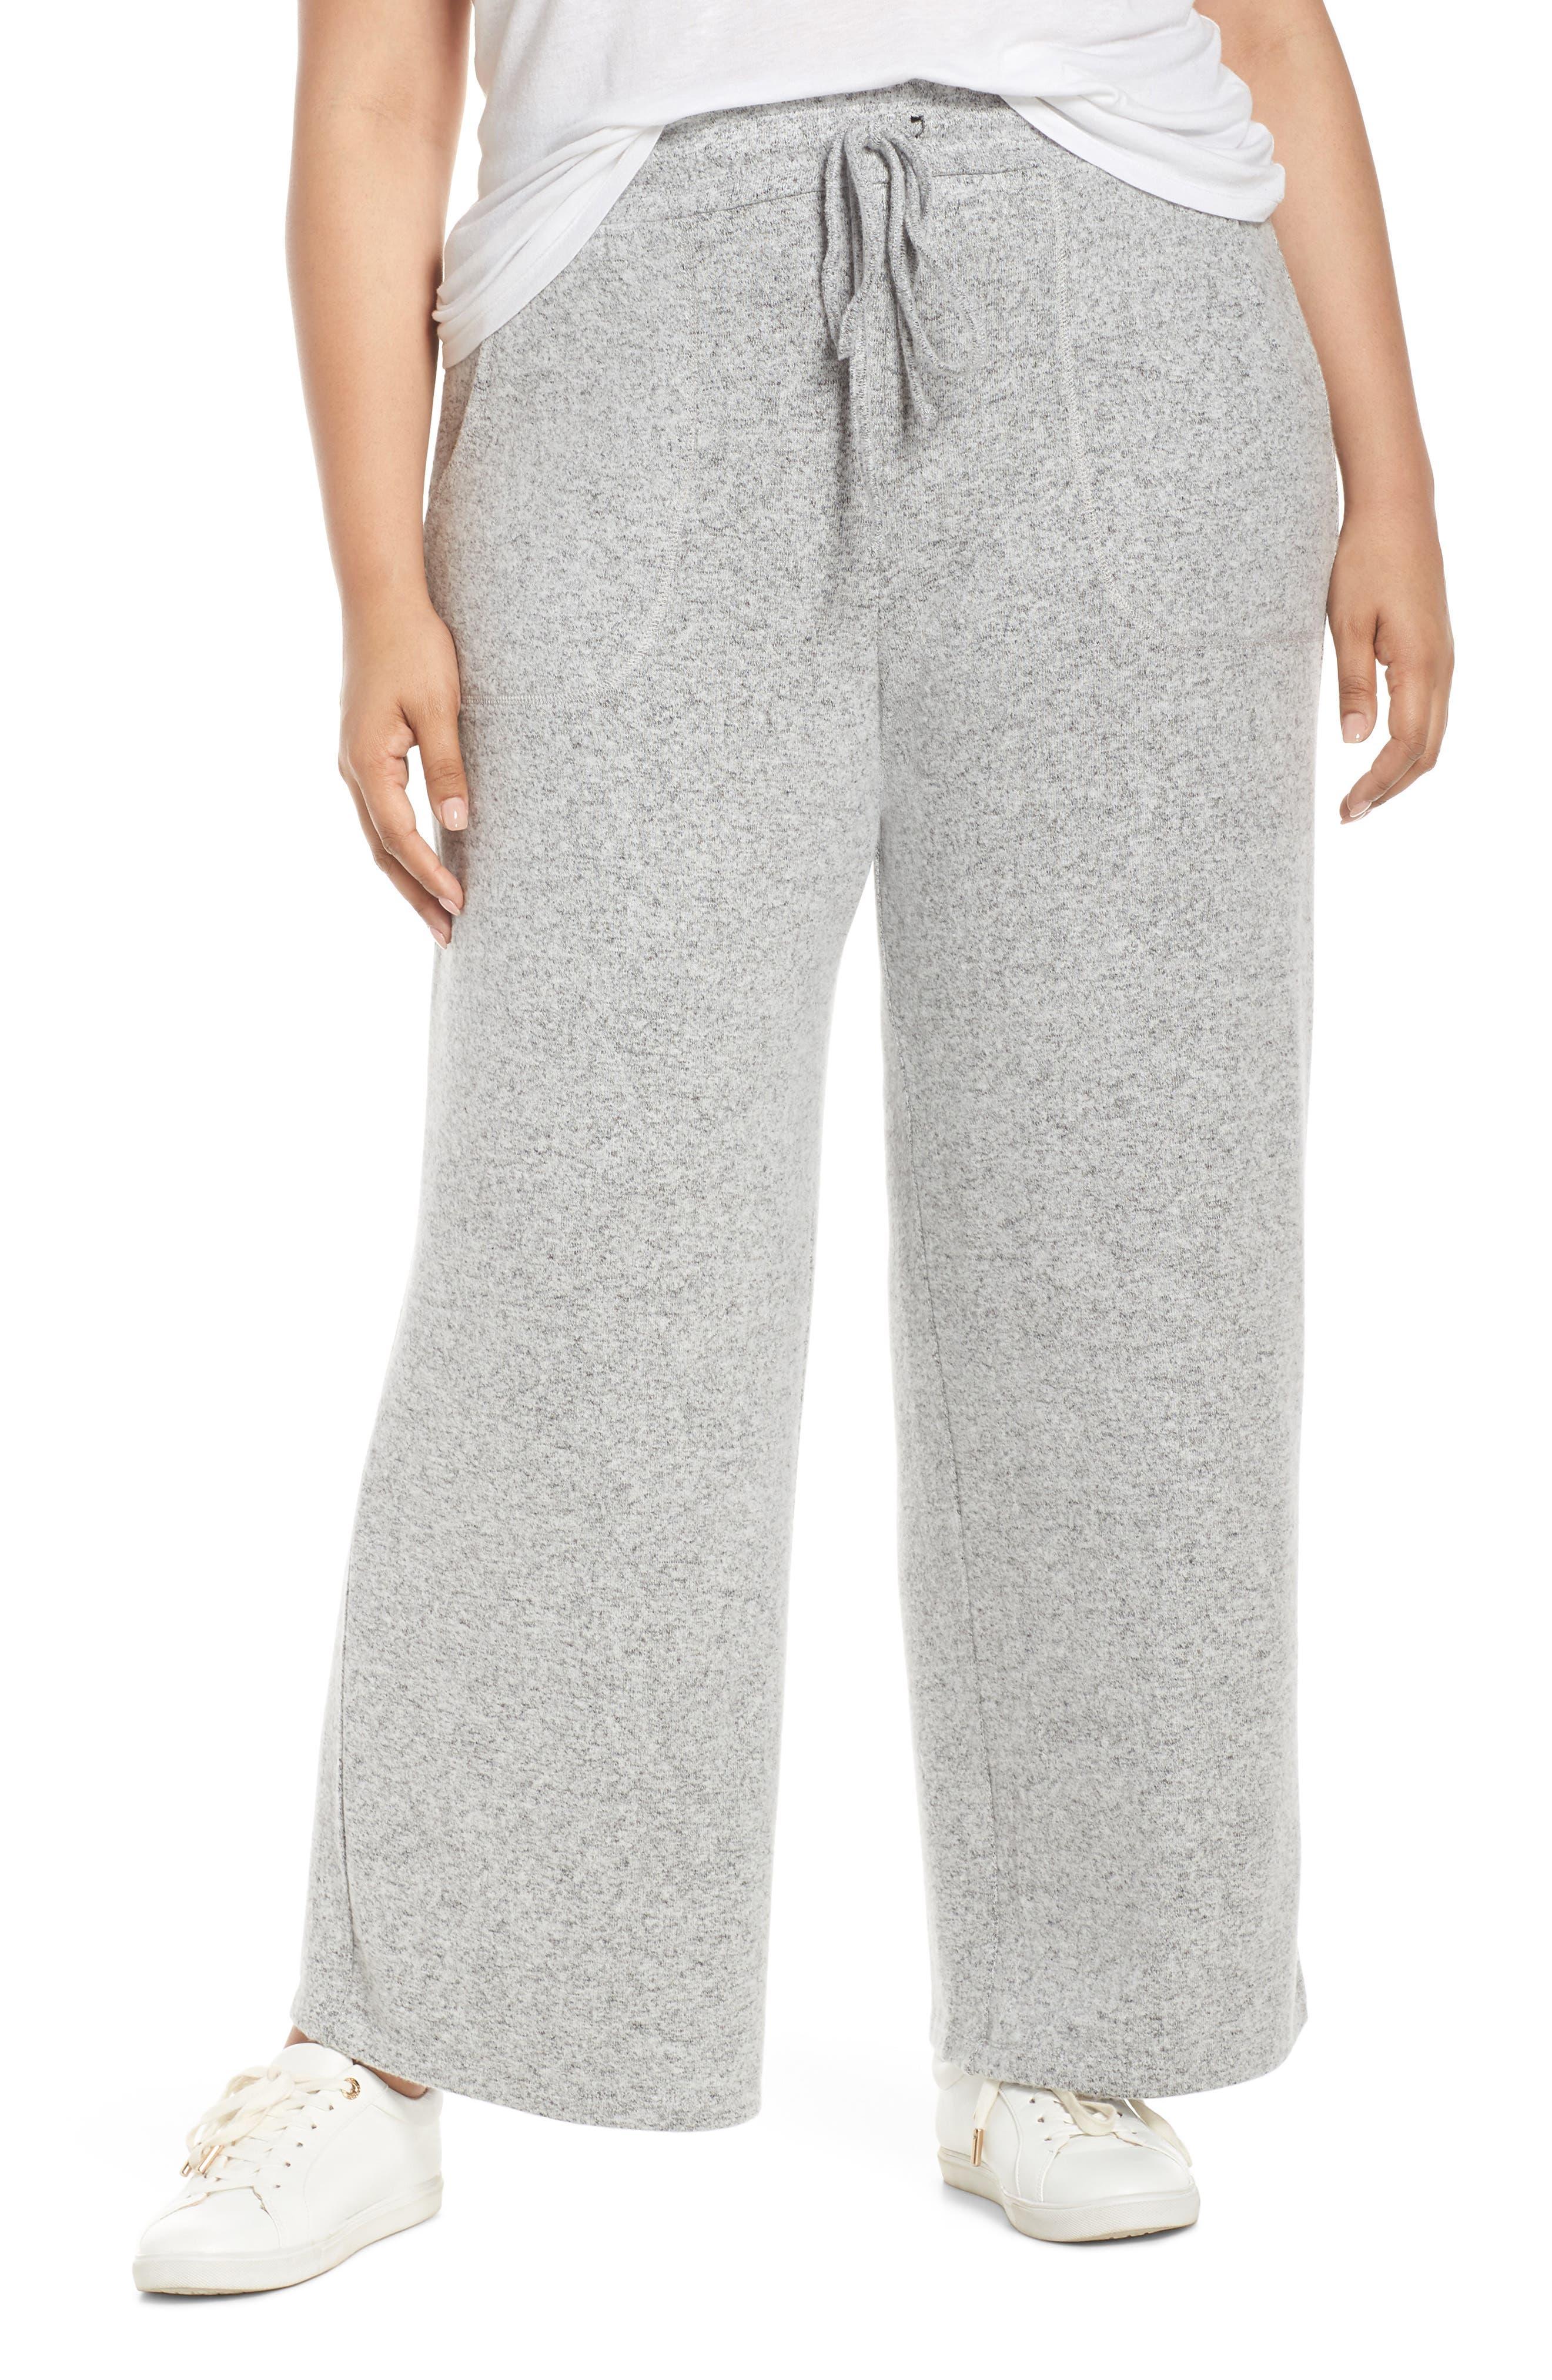 LEMON TART Norah Knit Lounge Pants, Main, color, HEATHER GREY